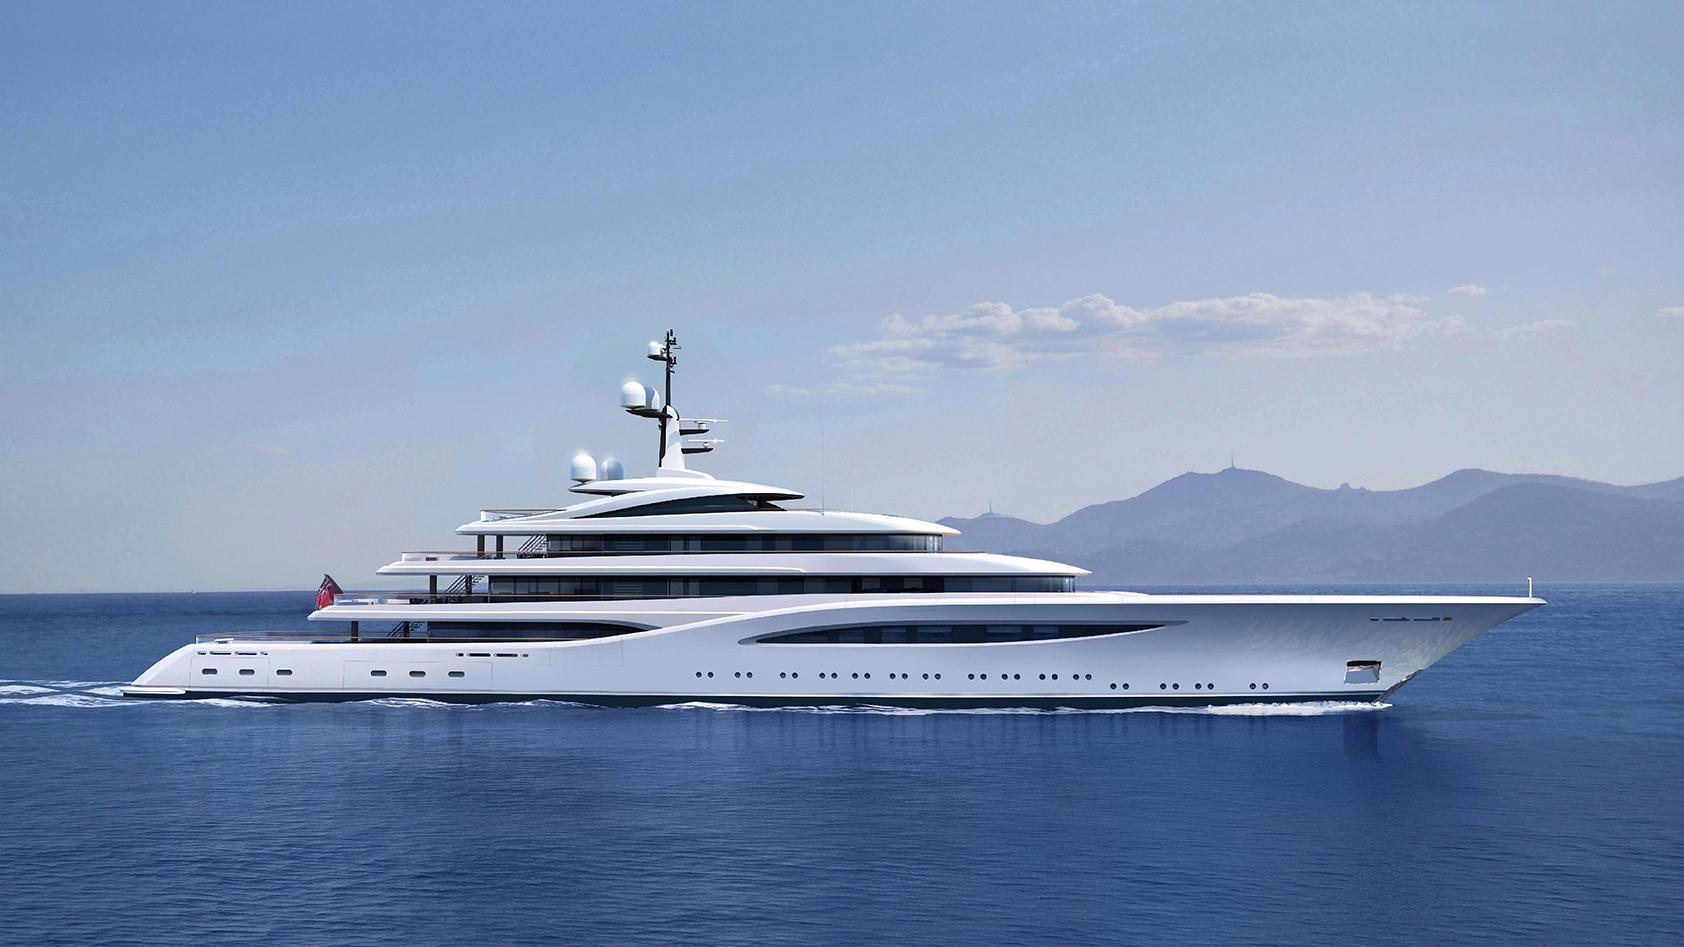 vertigo motoryacht feadship 2017 97m rendering profile cruising